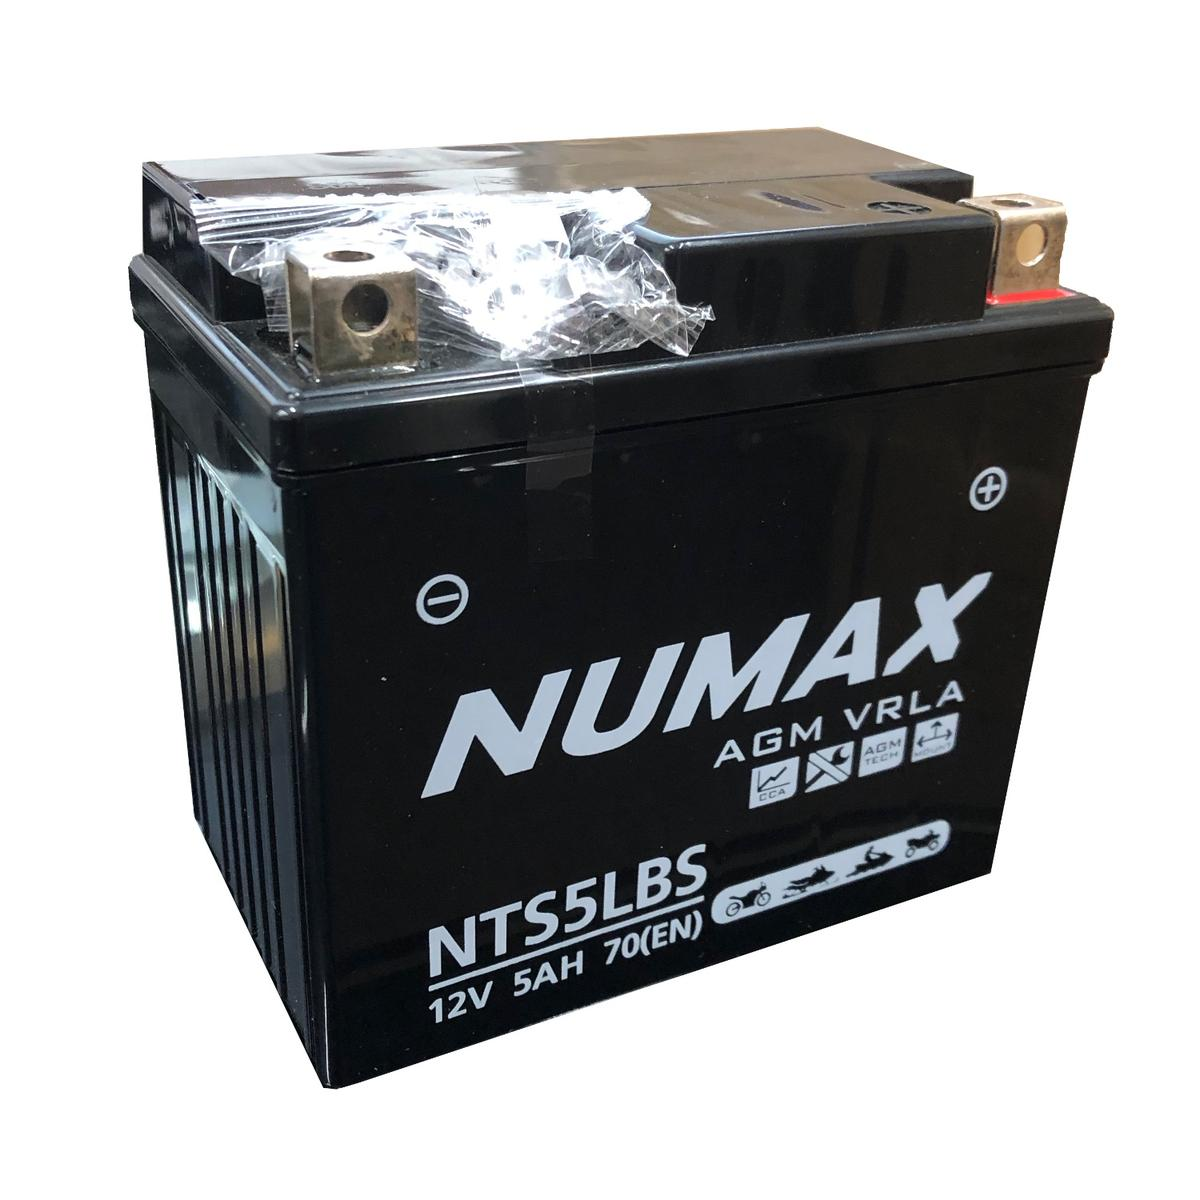 Numax 12v NTS5LBS Motorbike Bike Battery HONDA 150cc XLR150 YTX5L-4